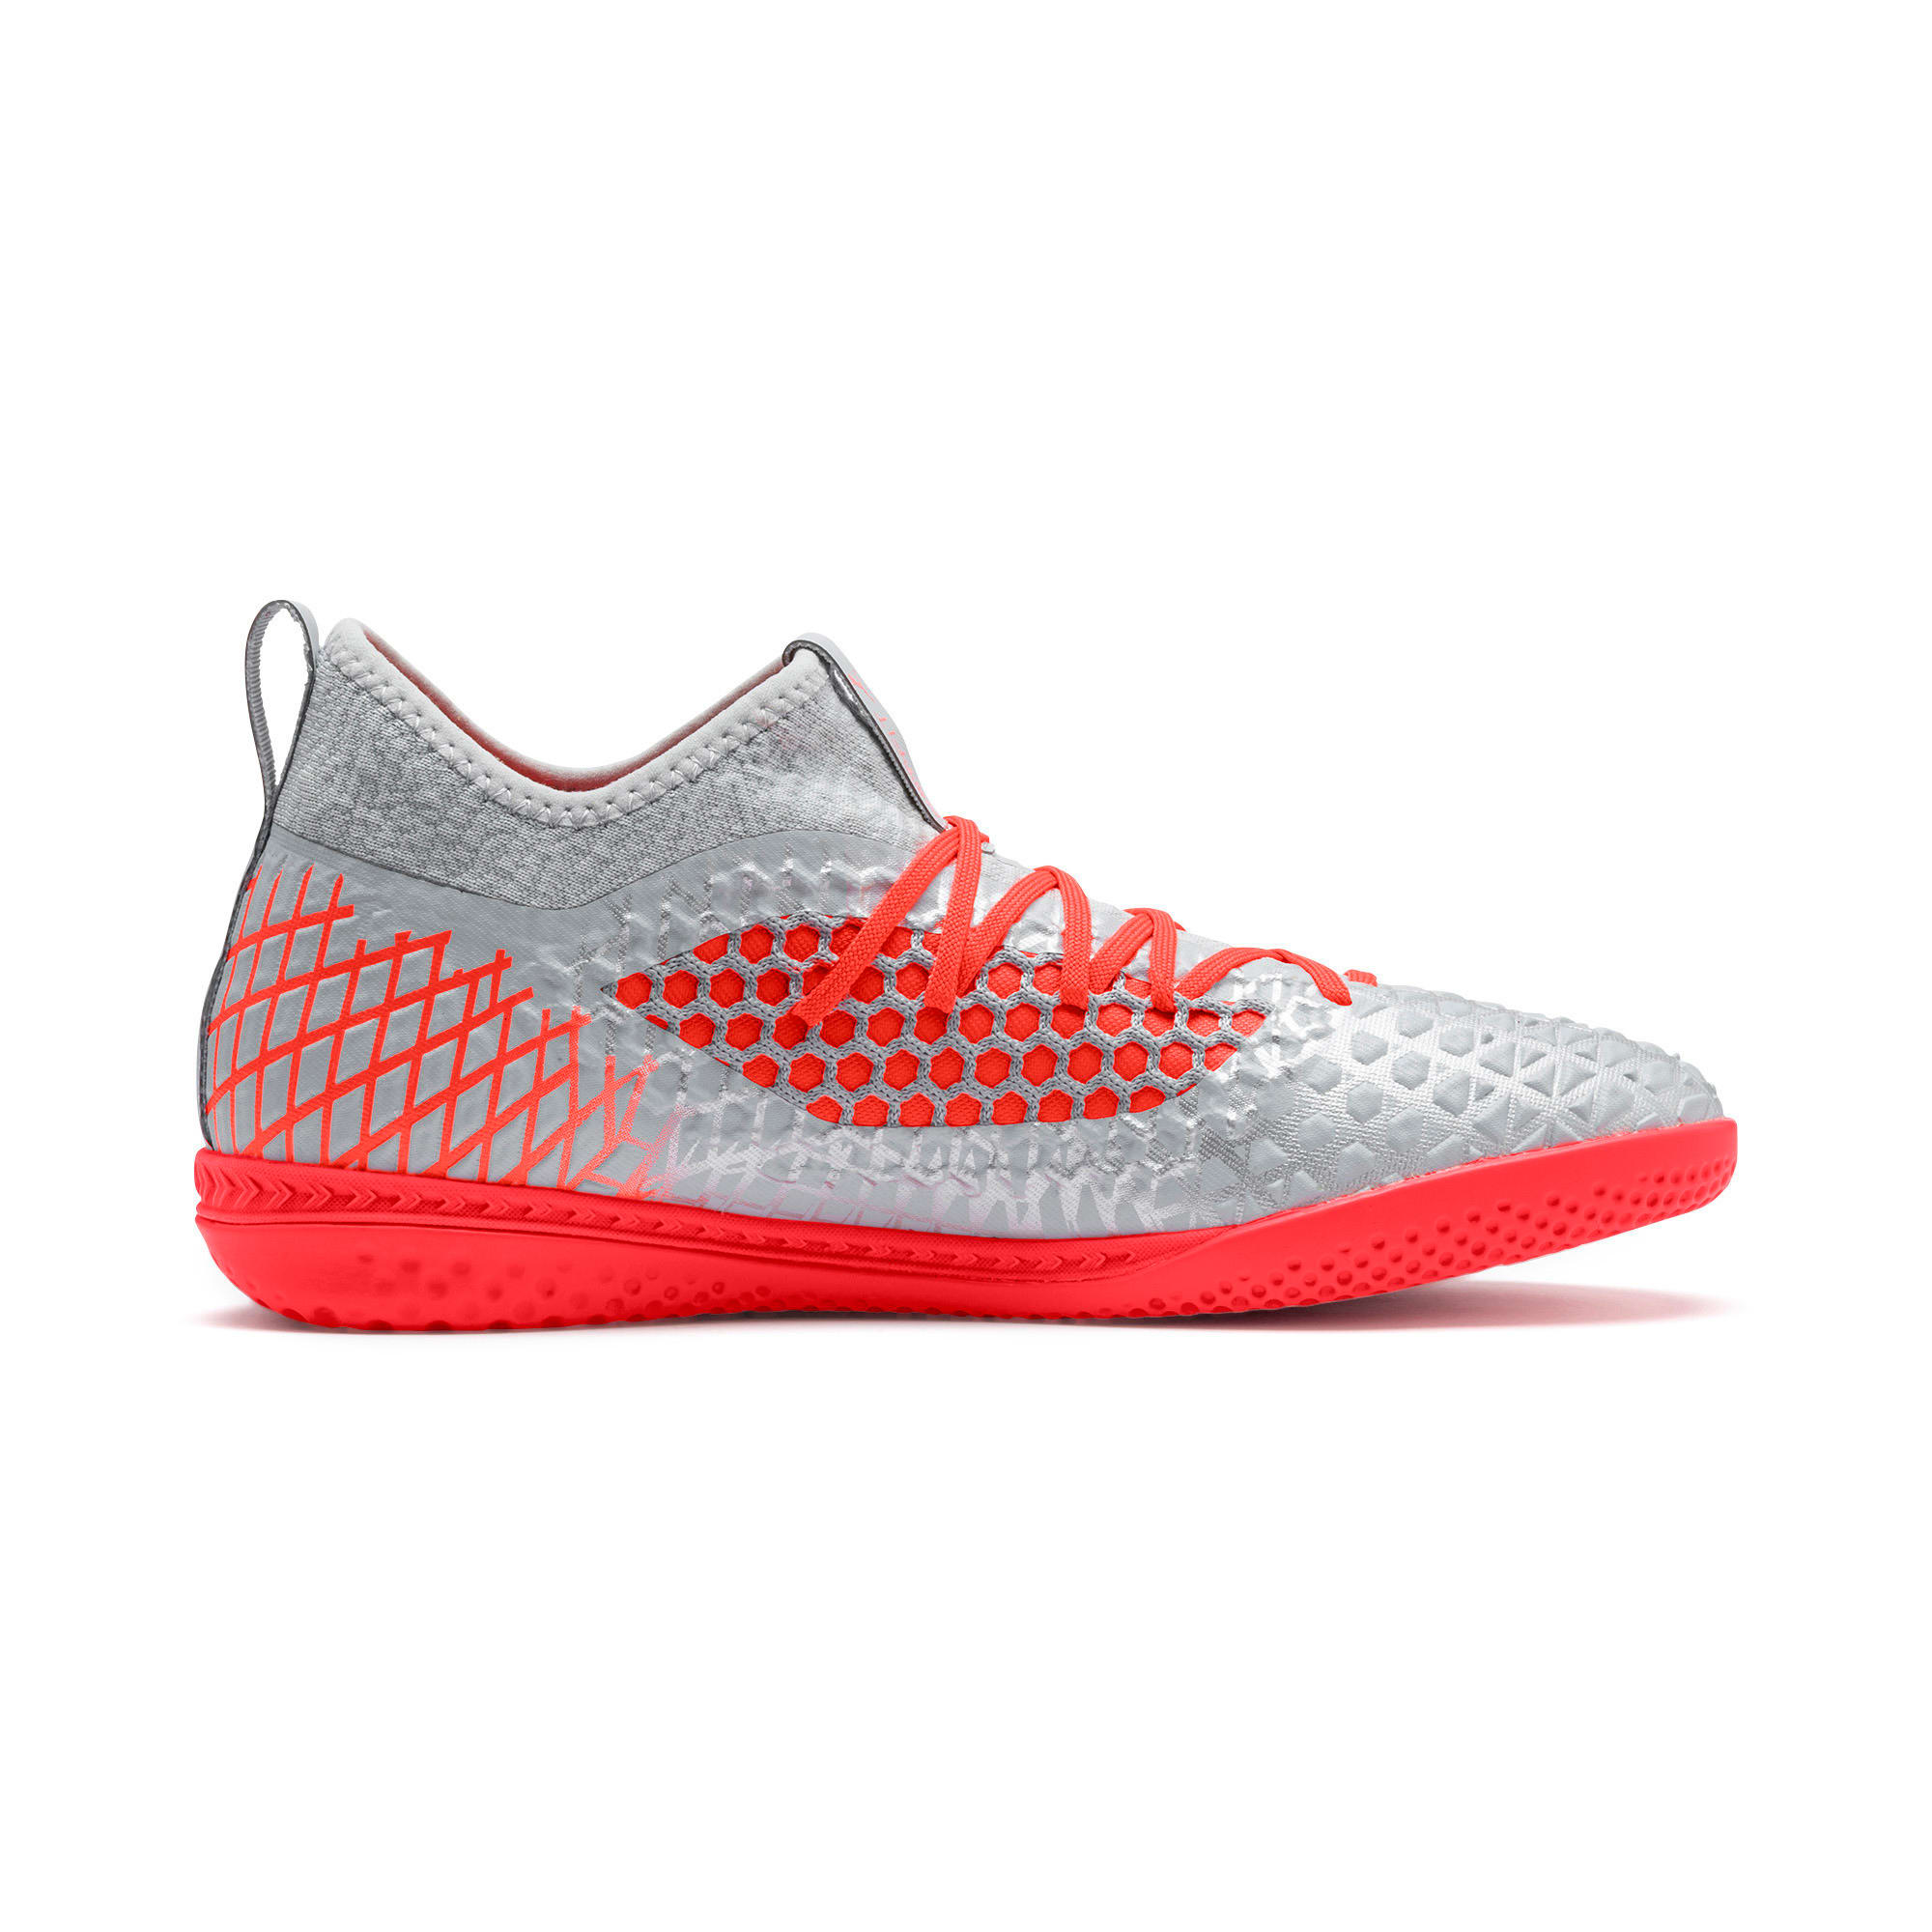 Thumbnail 6 of FUTURE 4.3 NETFIT IT Men's Soccer Shoes, Glacial Blue-Nrgy Red, medium